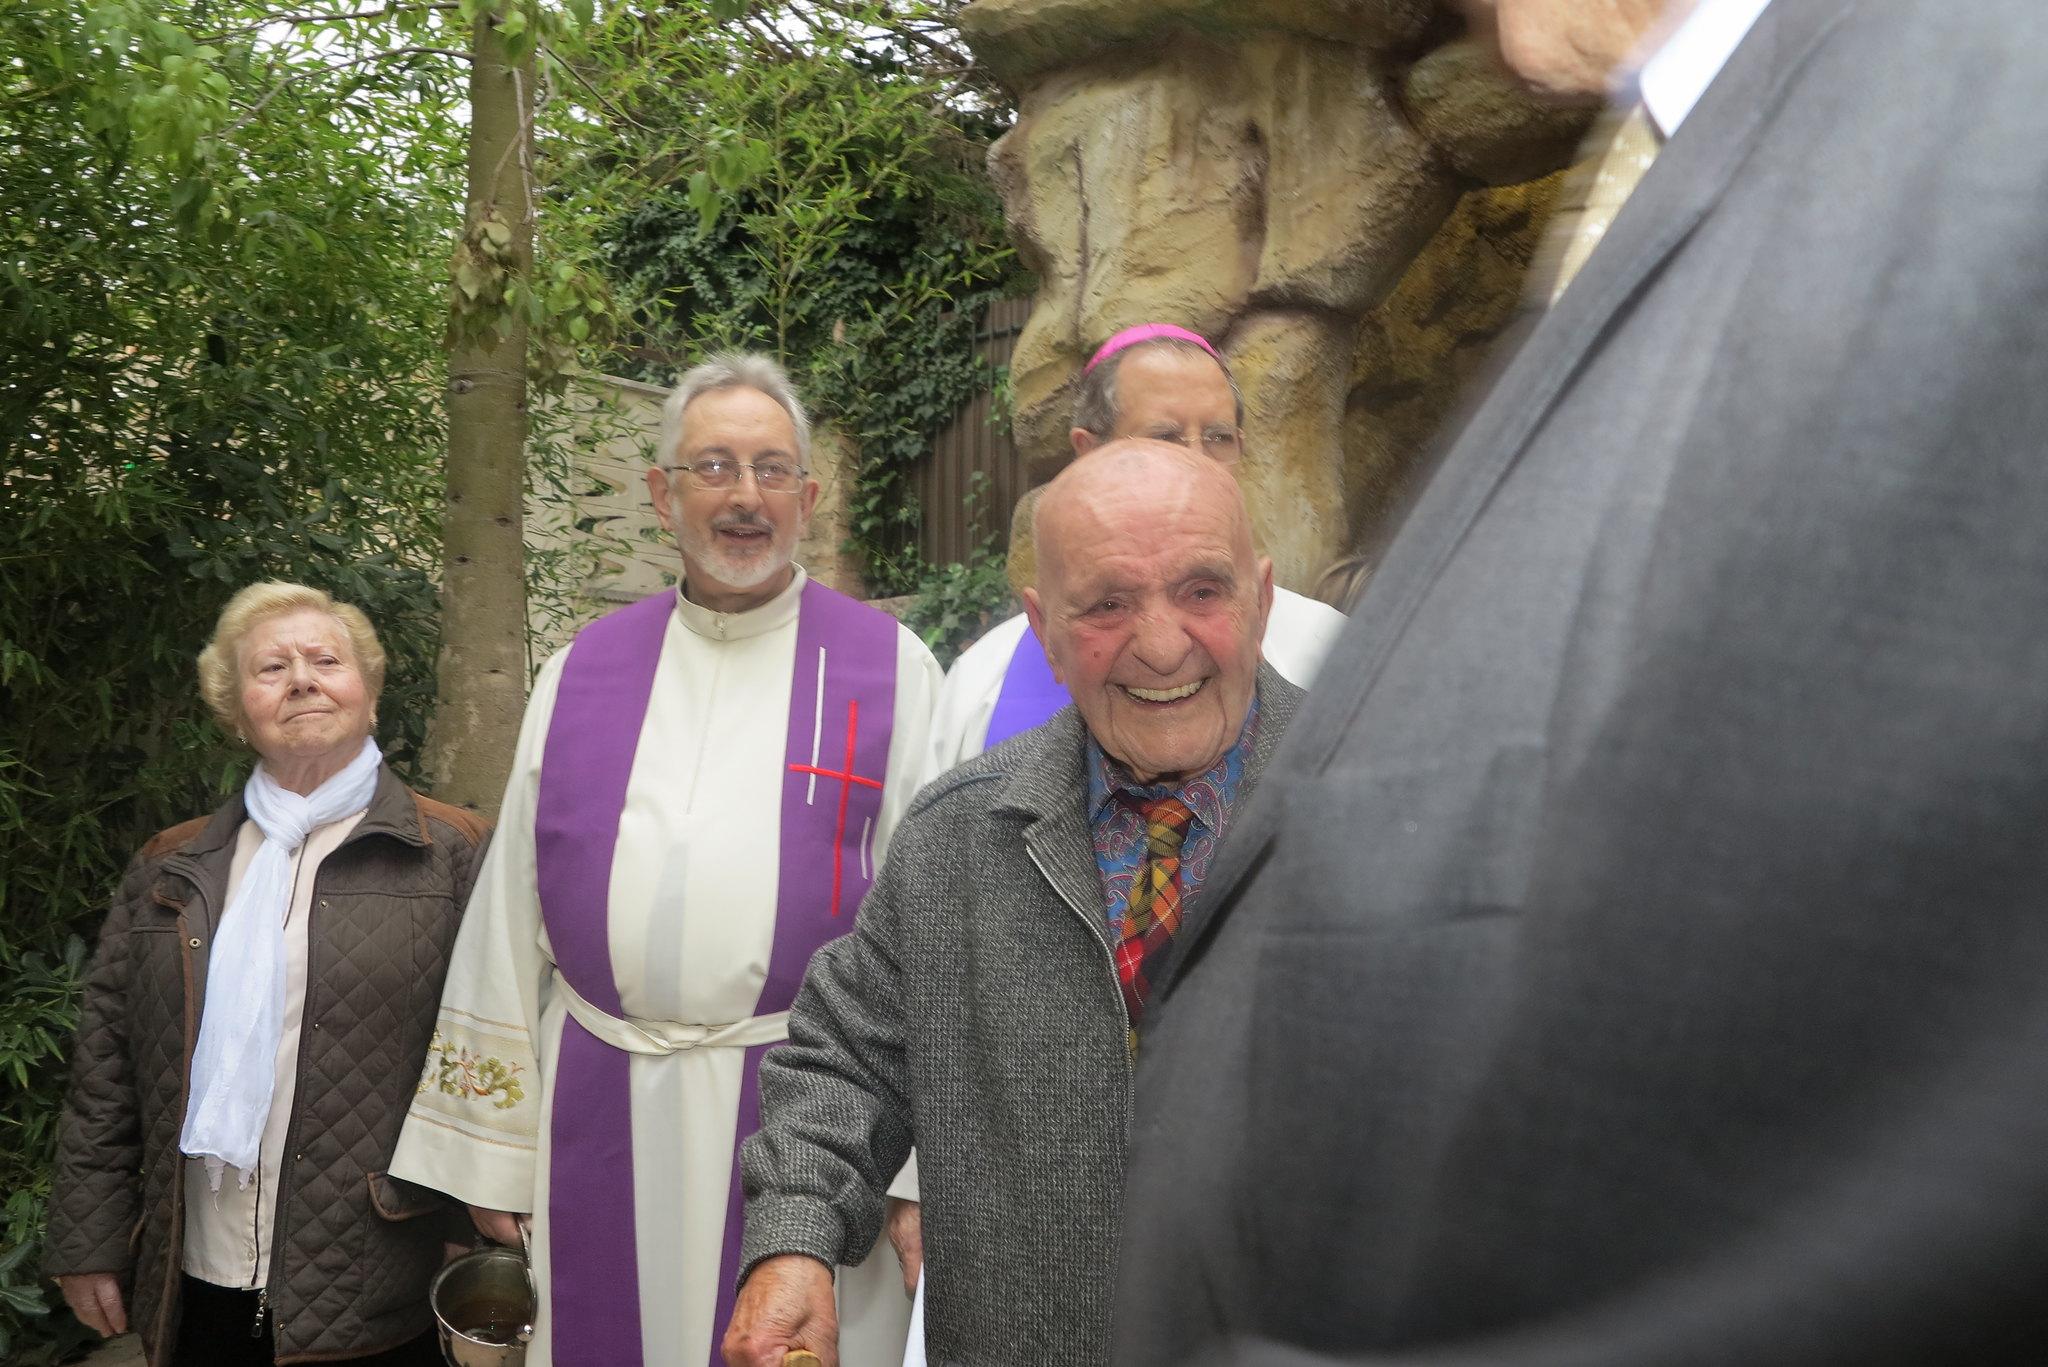 (2016-02-13) - Inauguración Virgen de Lourdes, La Molineta - Archivo La Molineta 2 (60)